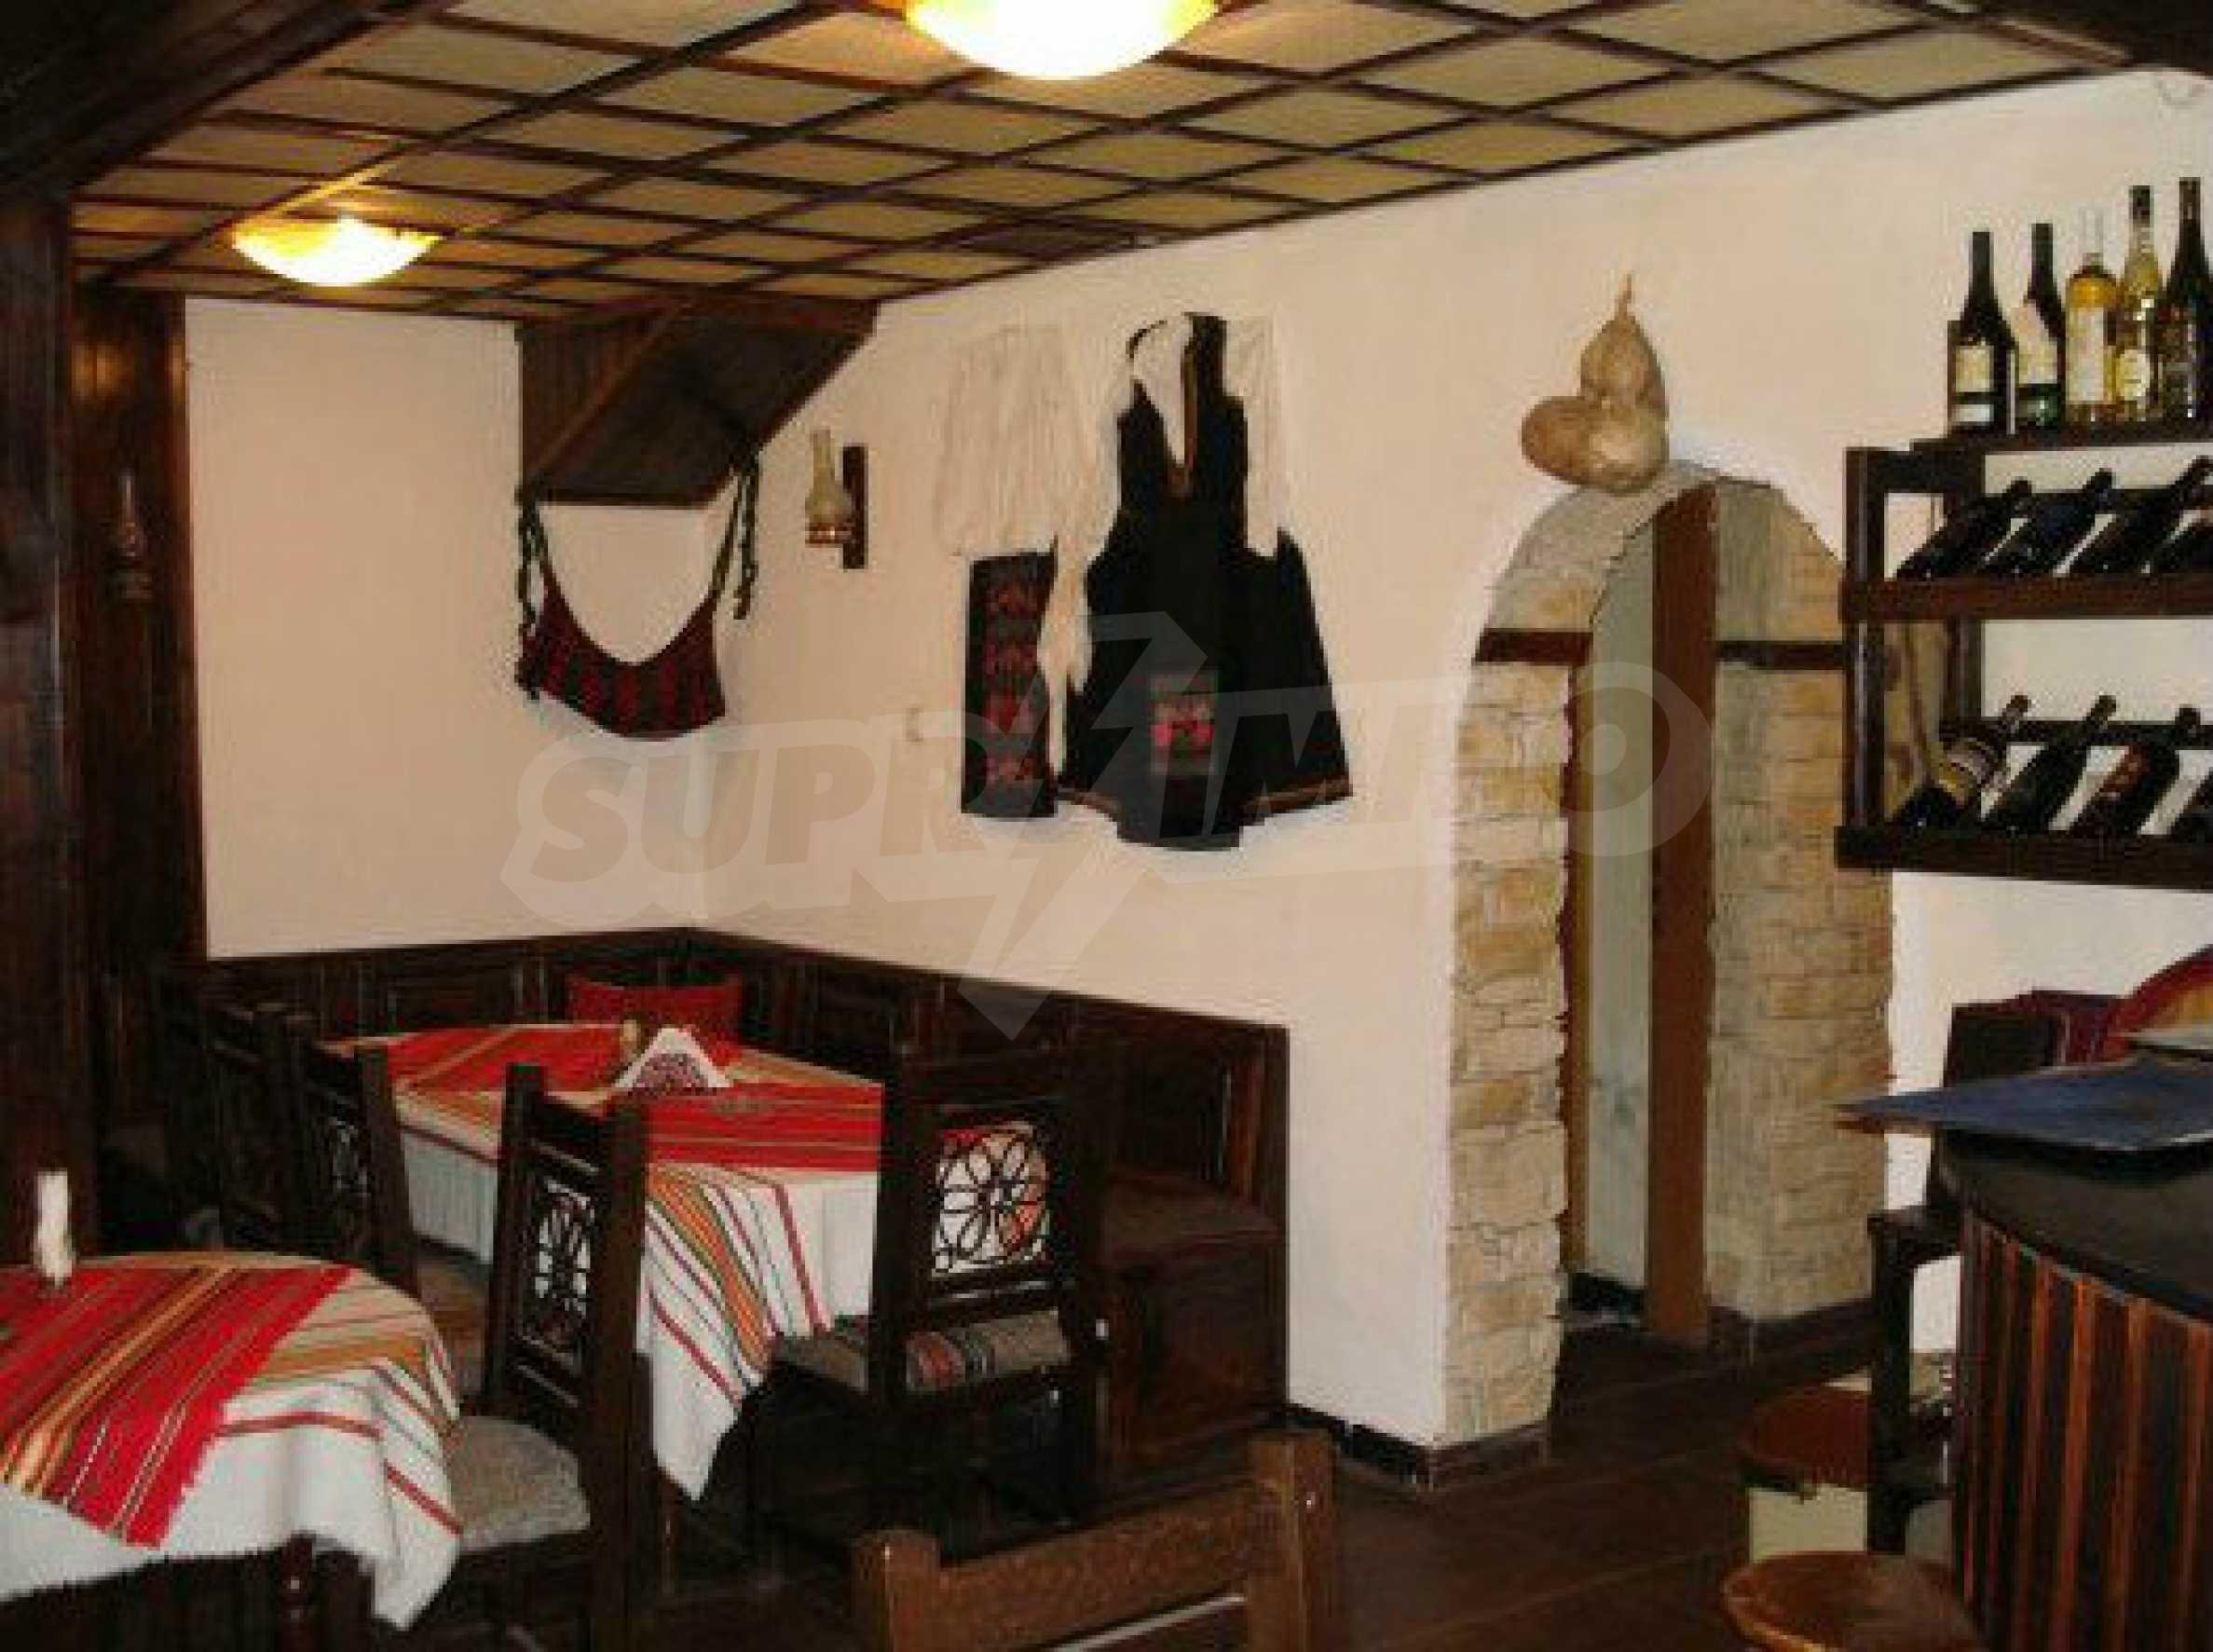 Hotelanlage mit Restaurant am Ufer des Flusses Osam in Lovech 53